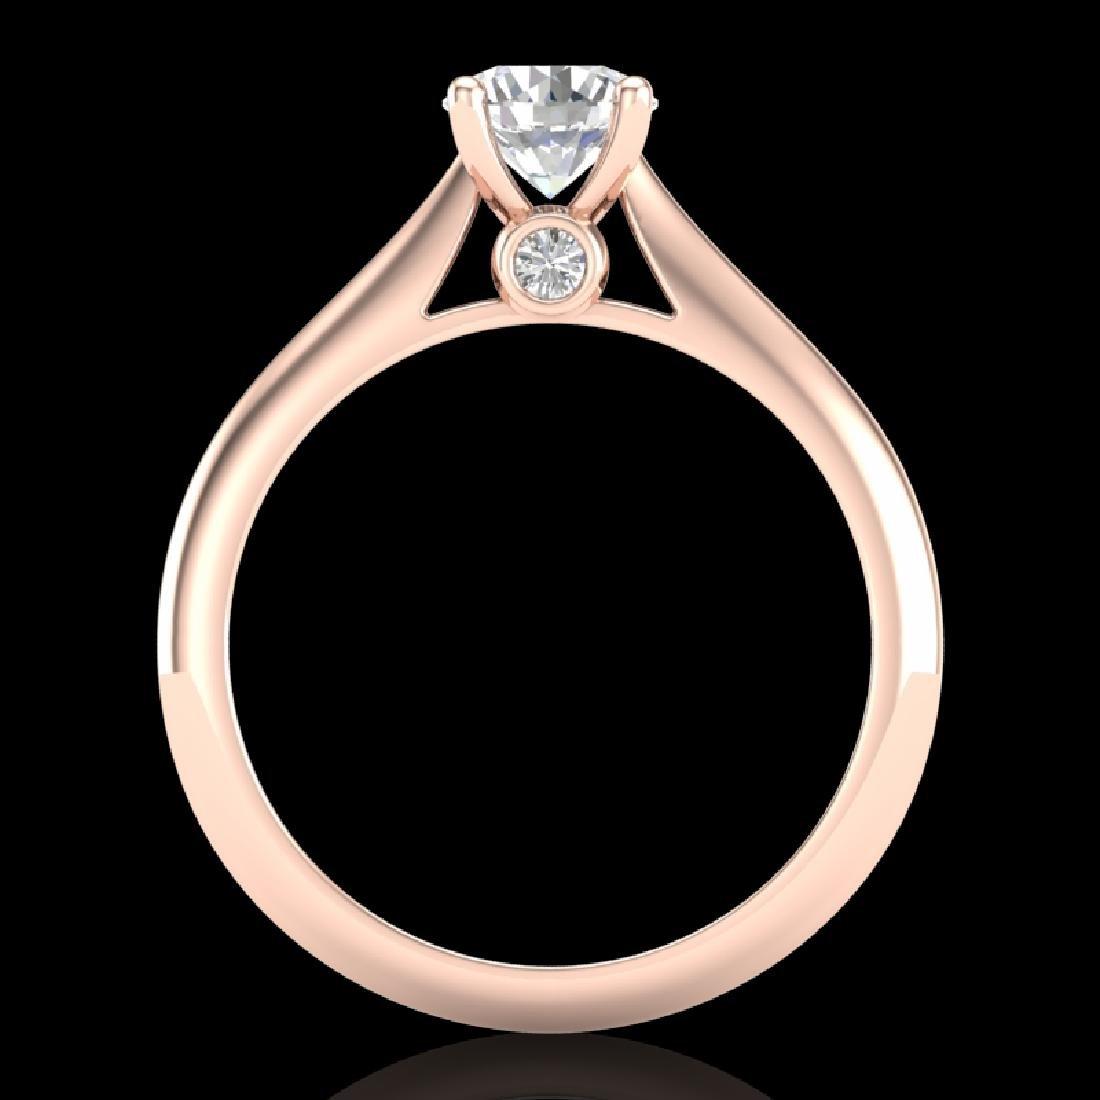 0.83 CTW VS/SI Diamond Solitaire Art Deco Ring 18K Rose - 3